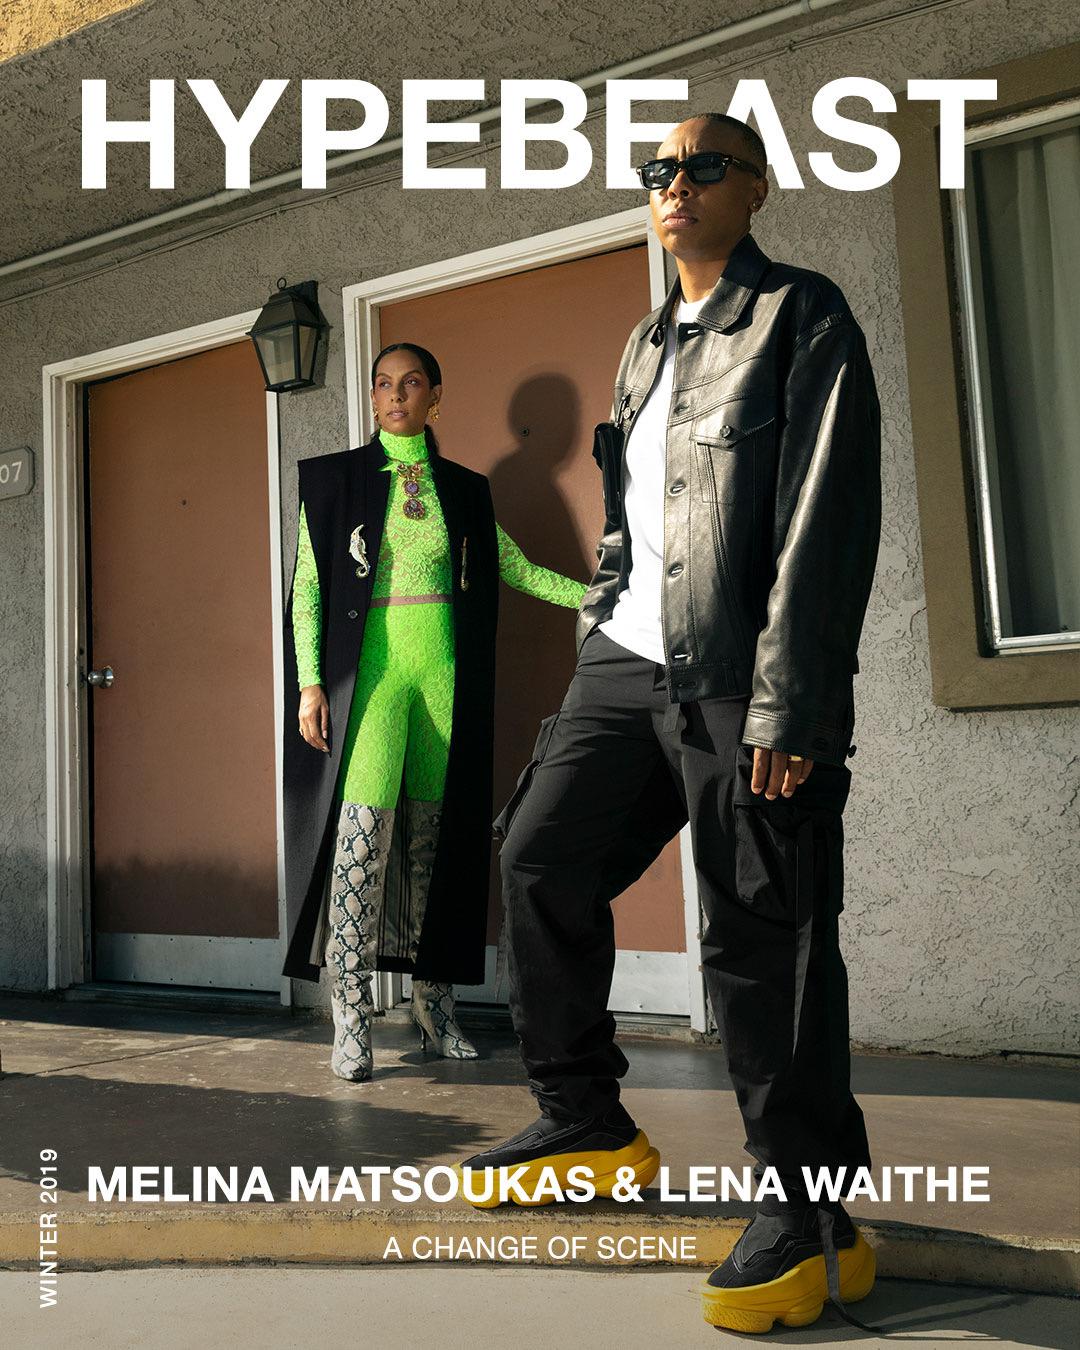 Lena waithe melina matsoukas hypebeast queen and slim cover nia groce